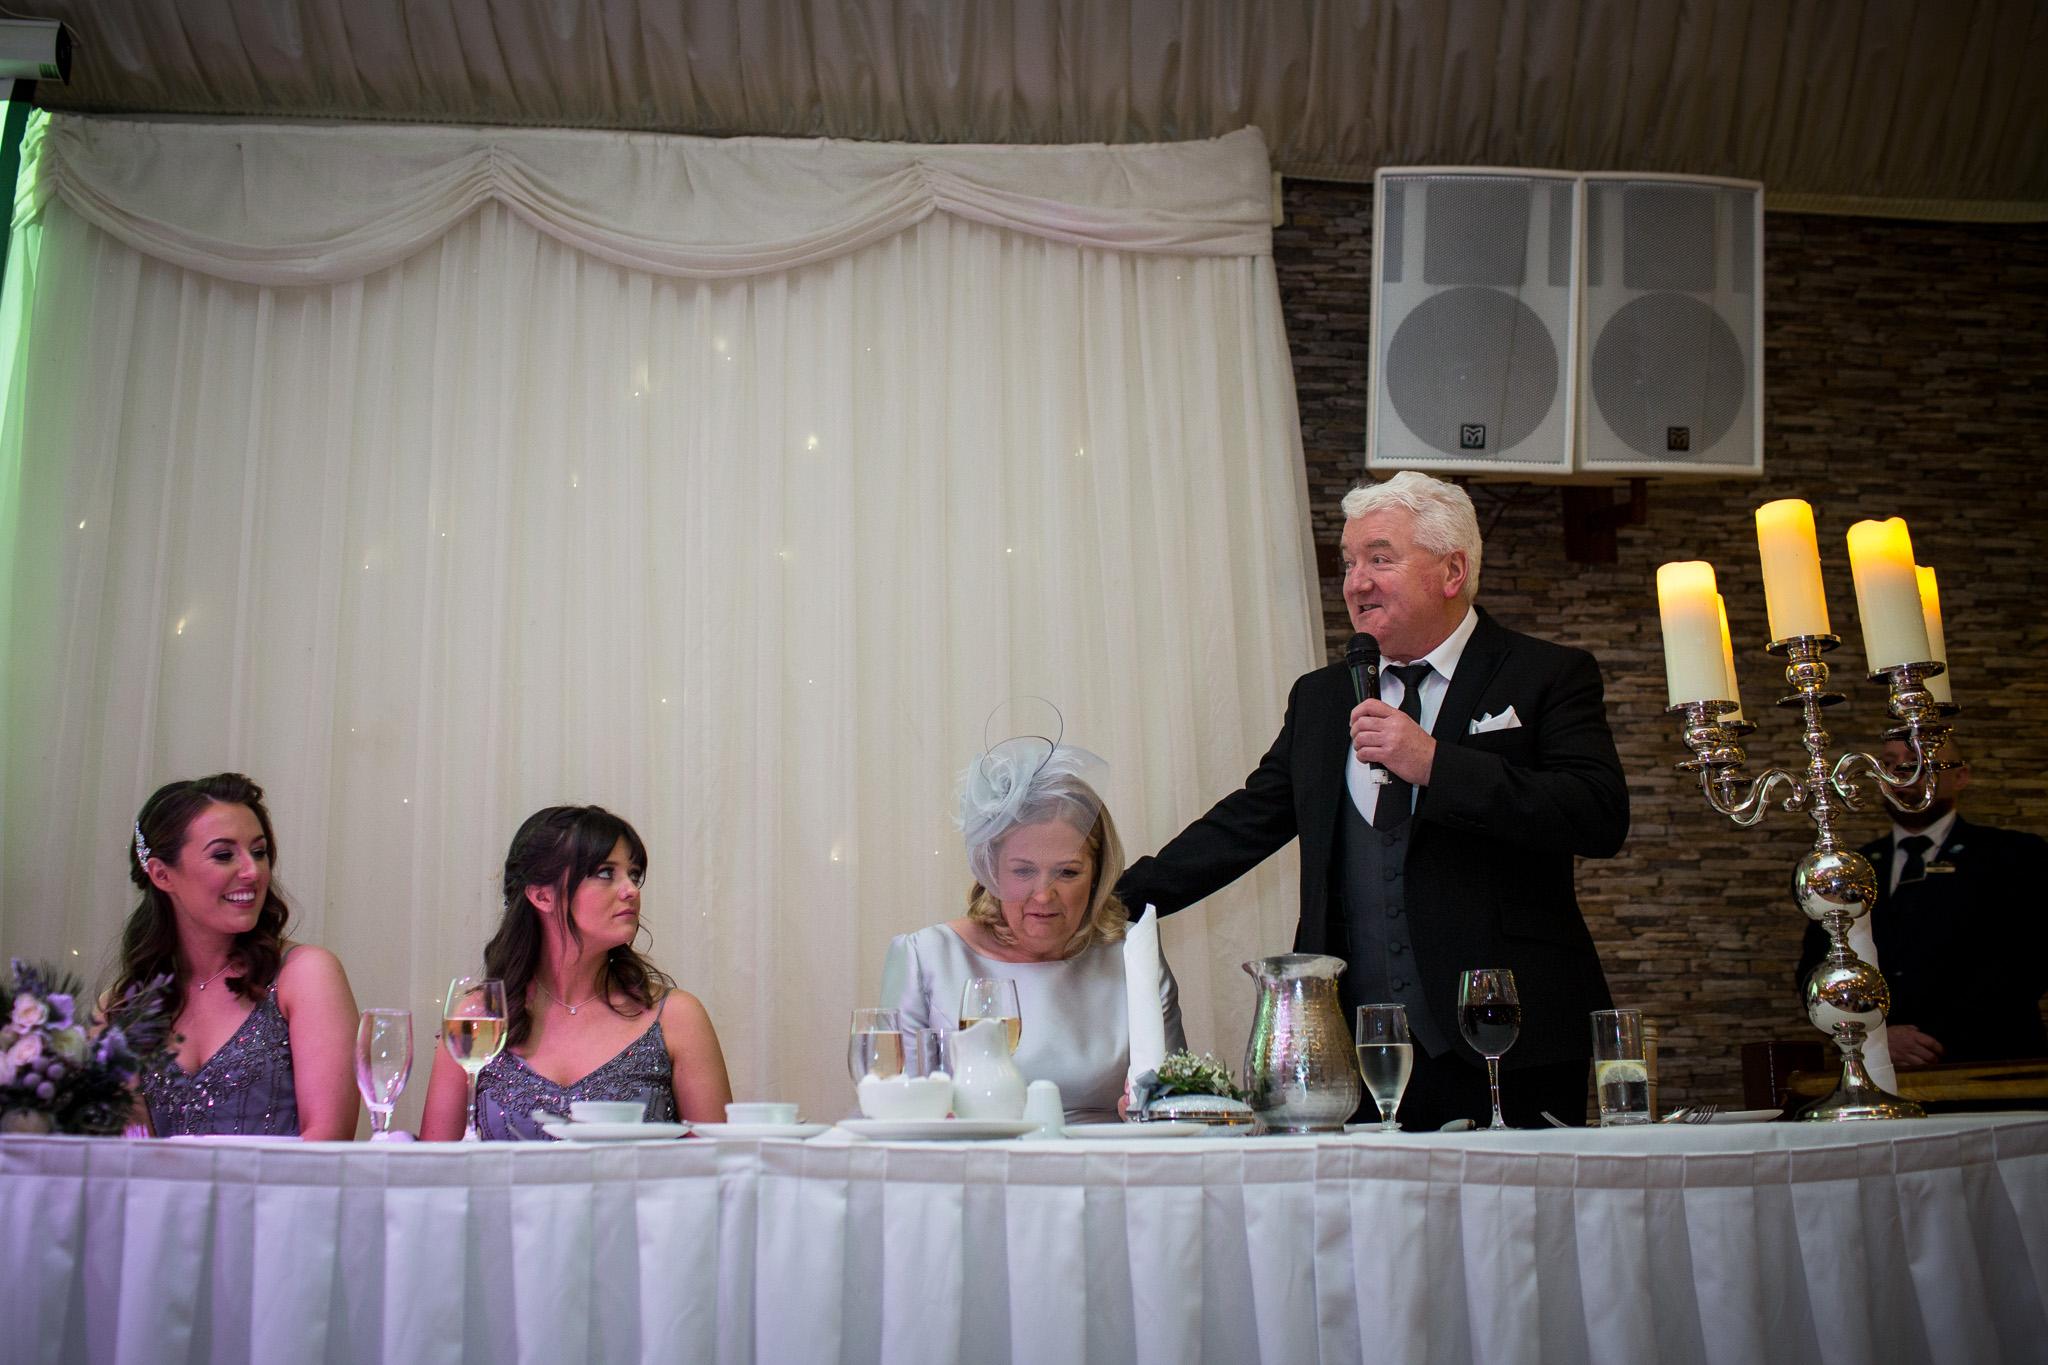 Mark_Barnes_Northern_Ireland_wedding_photographer_Harveys_Point_Donegall_Wedding_photography-Adam&Gemma-48.jpg